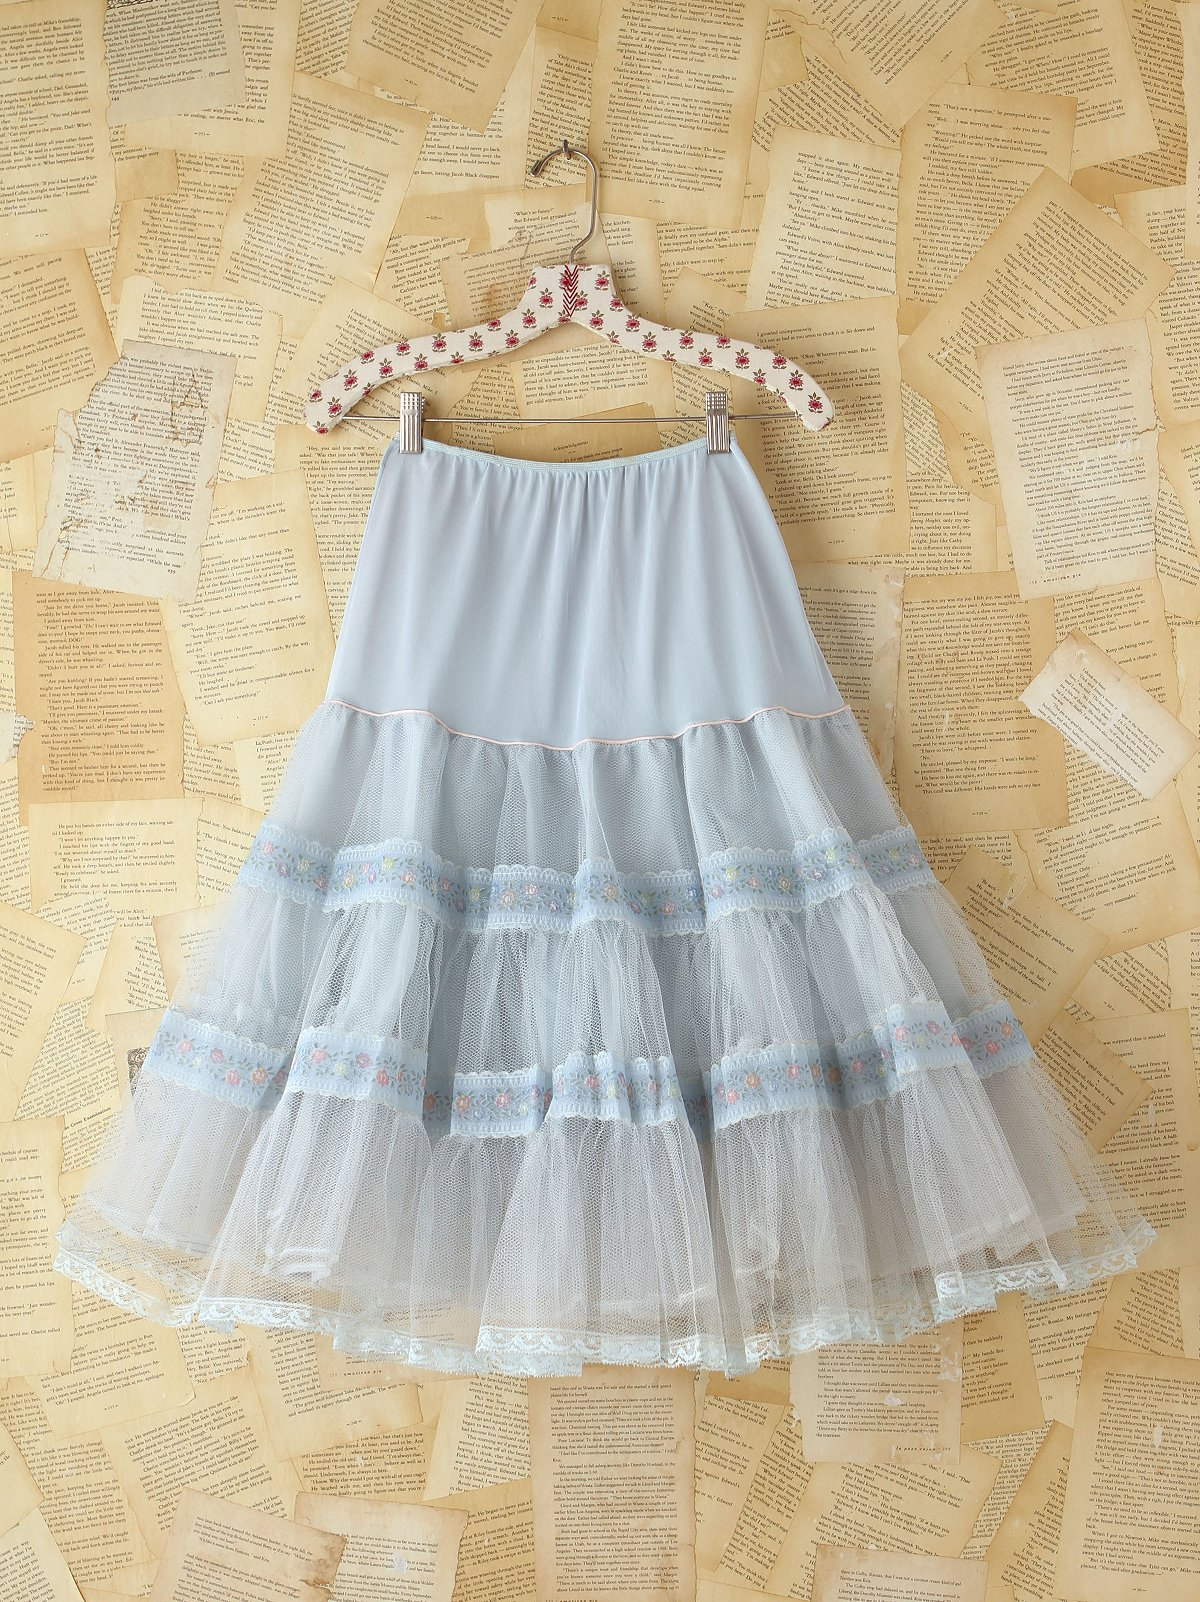 Vintage Tiered Mesh Skirt